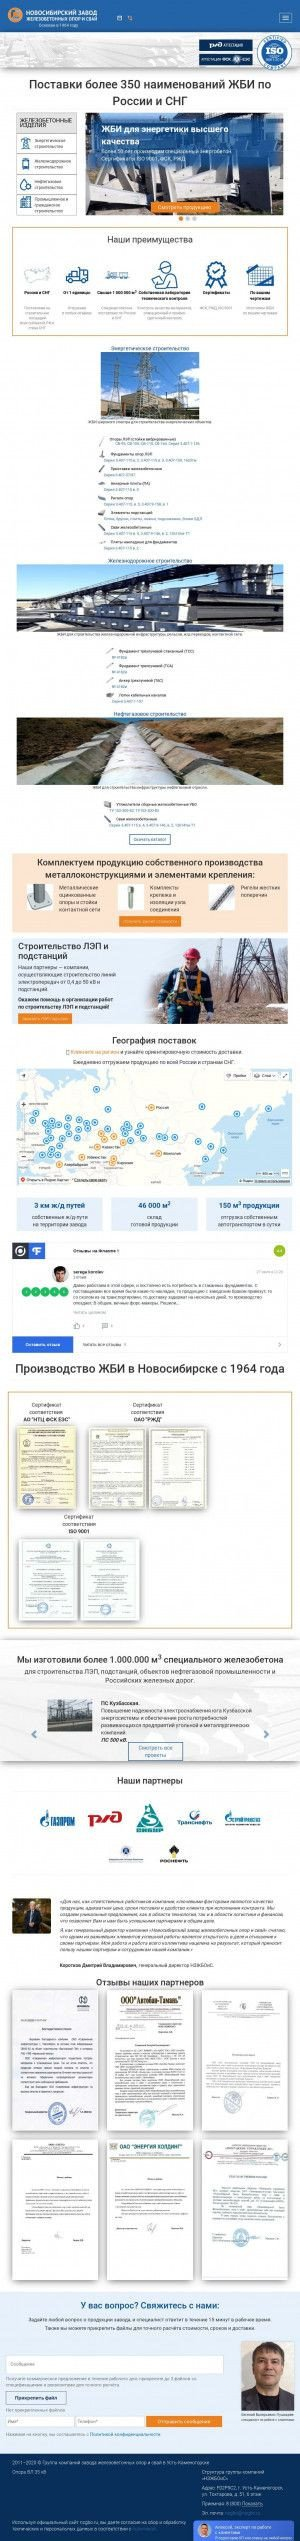 Предпросмотр для ust-kamenogorsk.nzgbo.ru — НЗЖБОиС